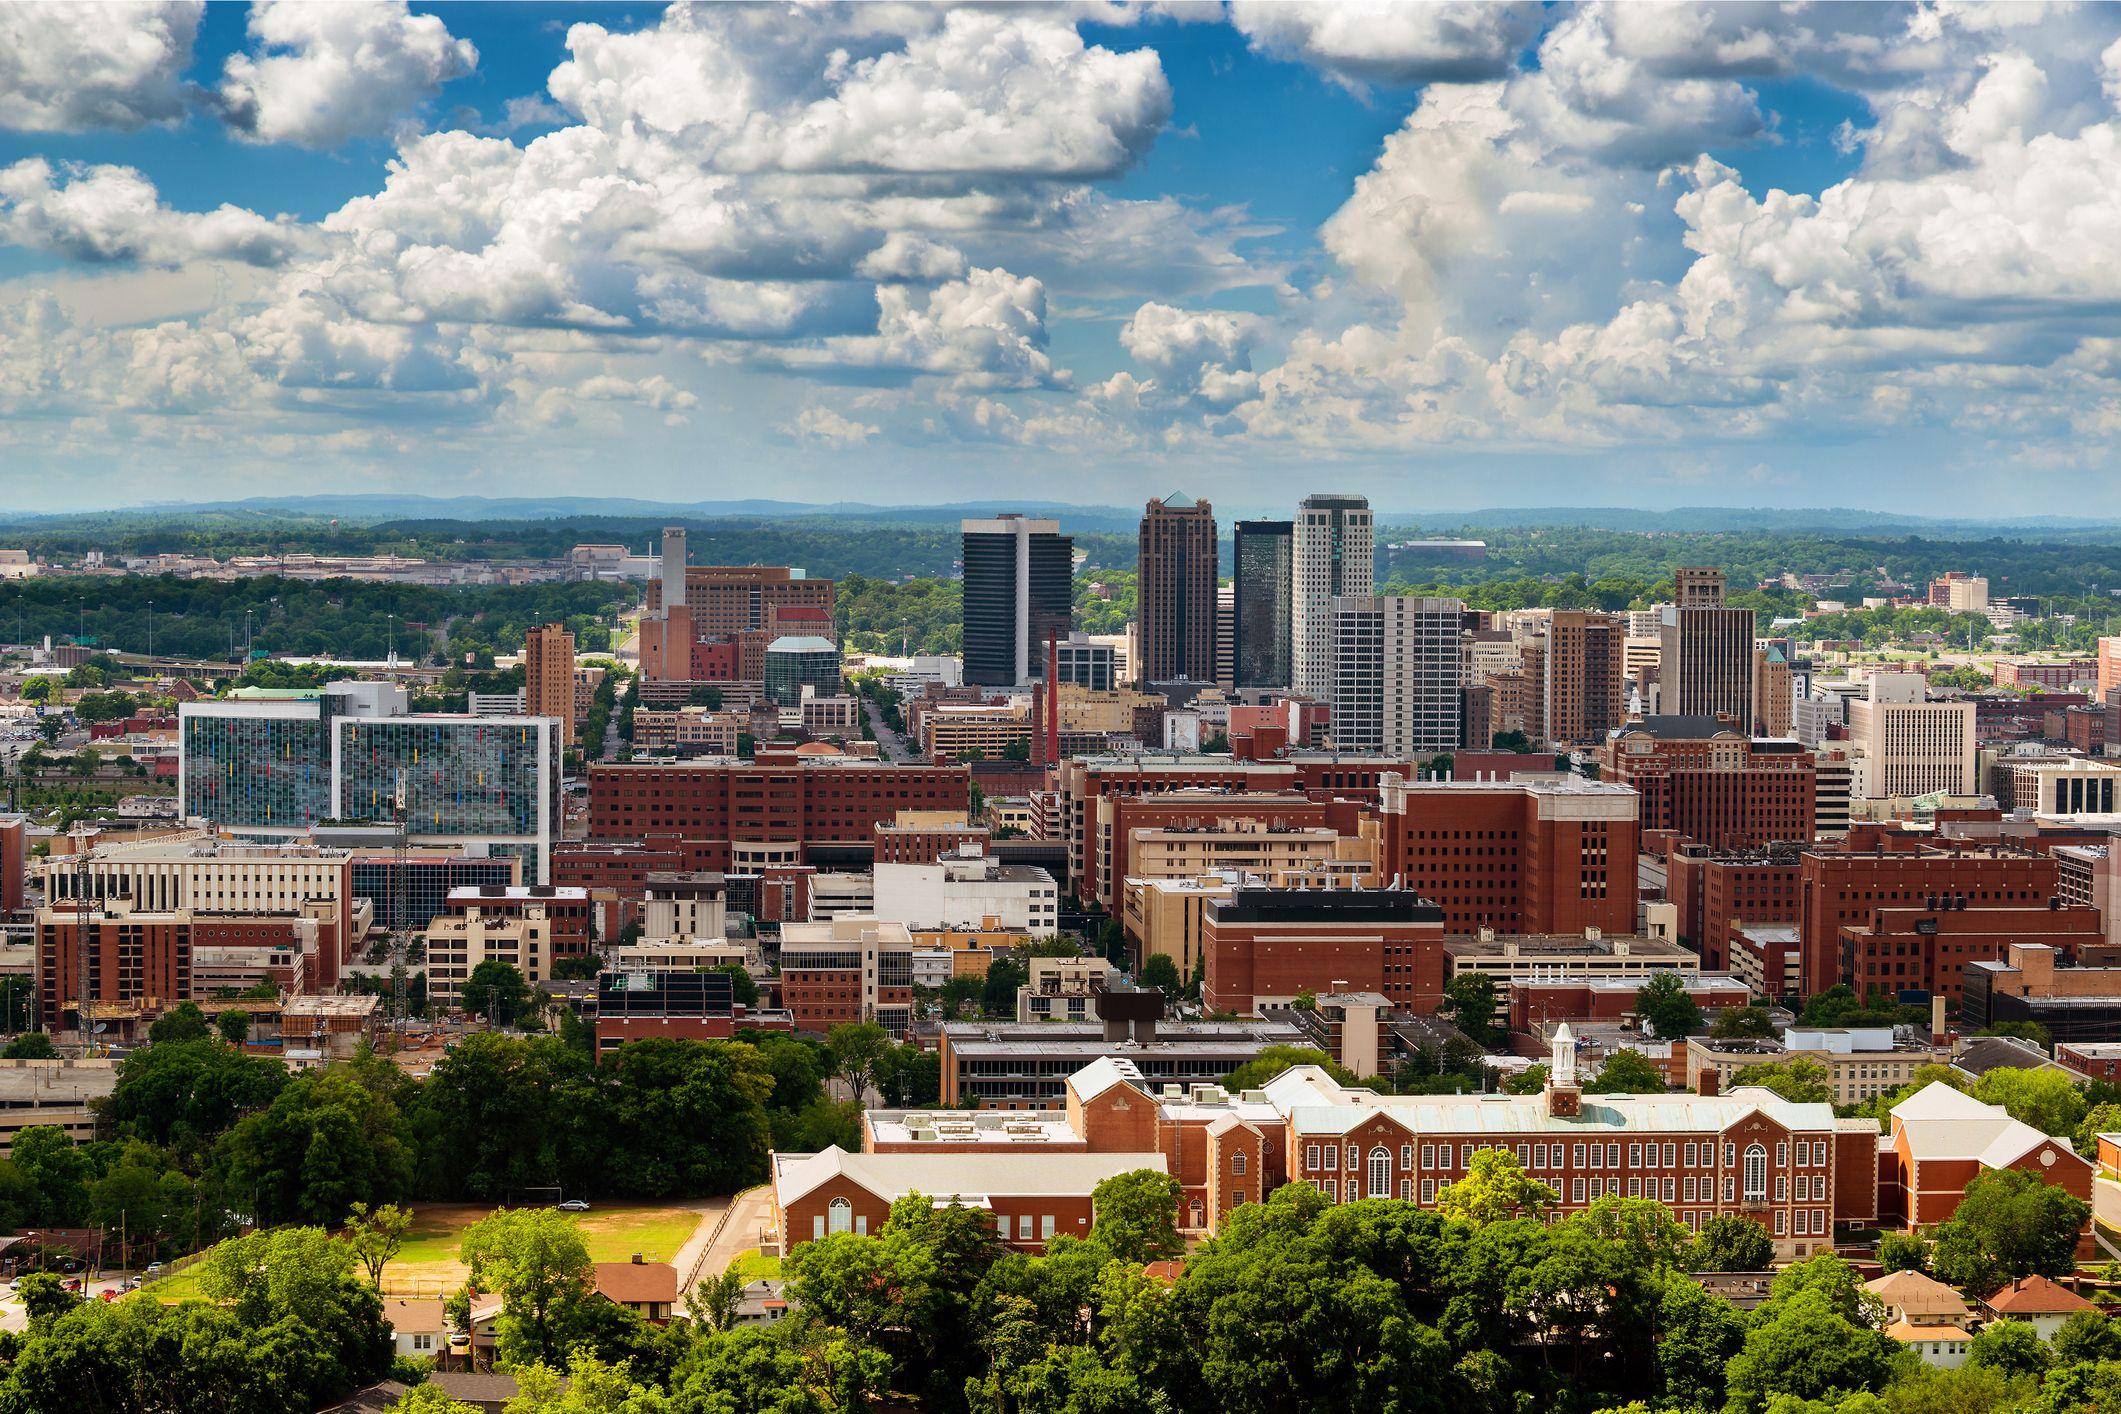 11_14_Birmingham, Alabama